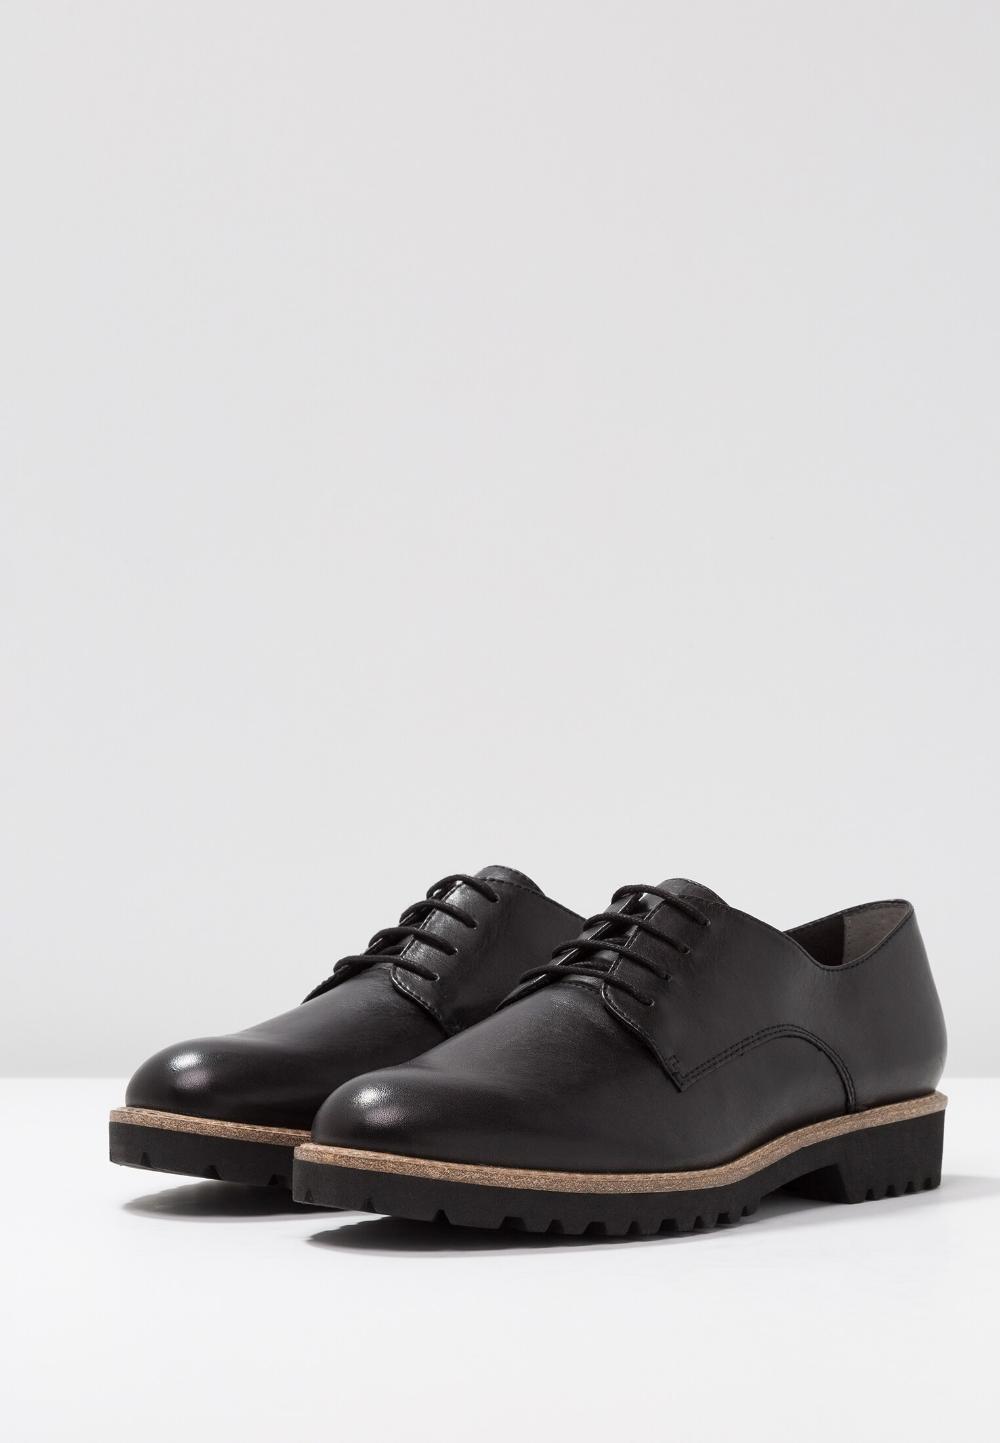 Tamaris Oksfordki Black Zalando Pl Dress Shoes Men Oxford Shoes Shoes